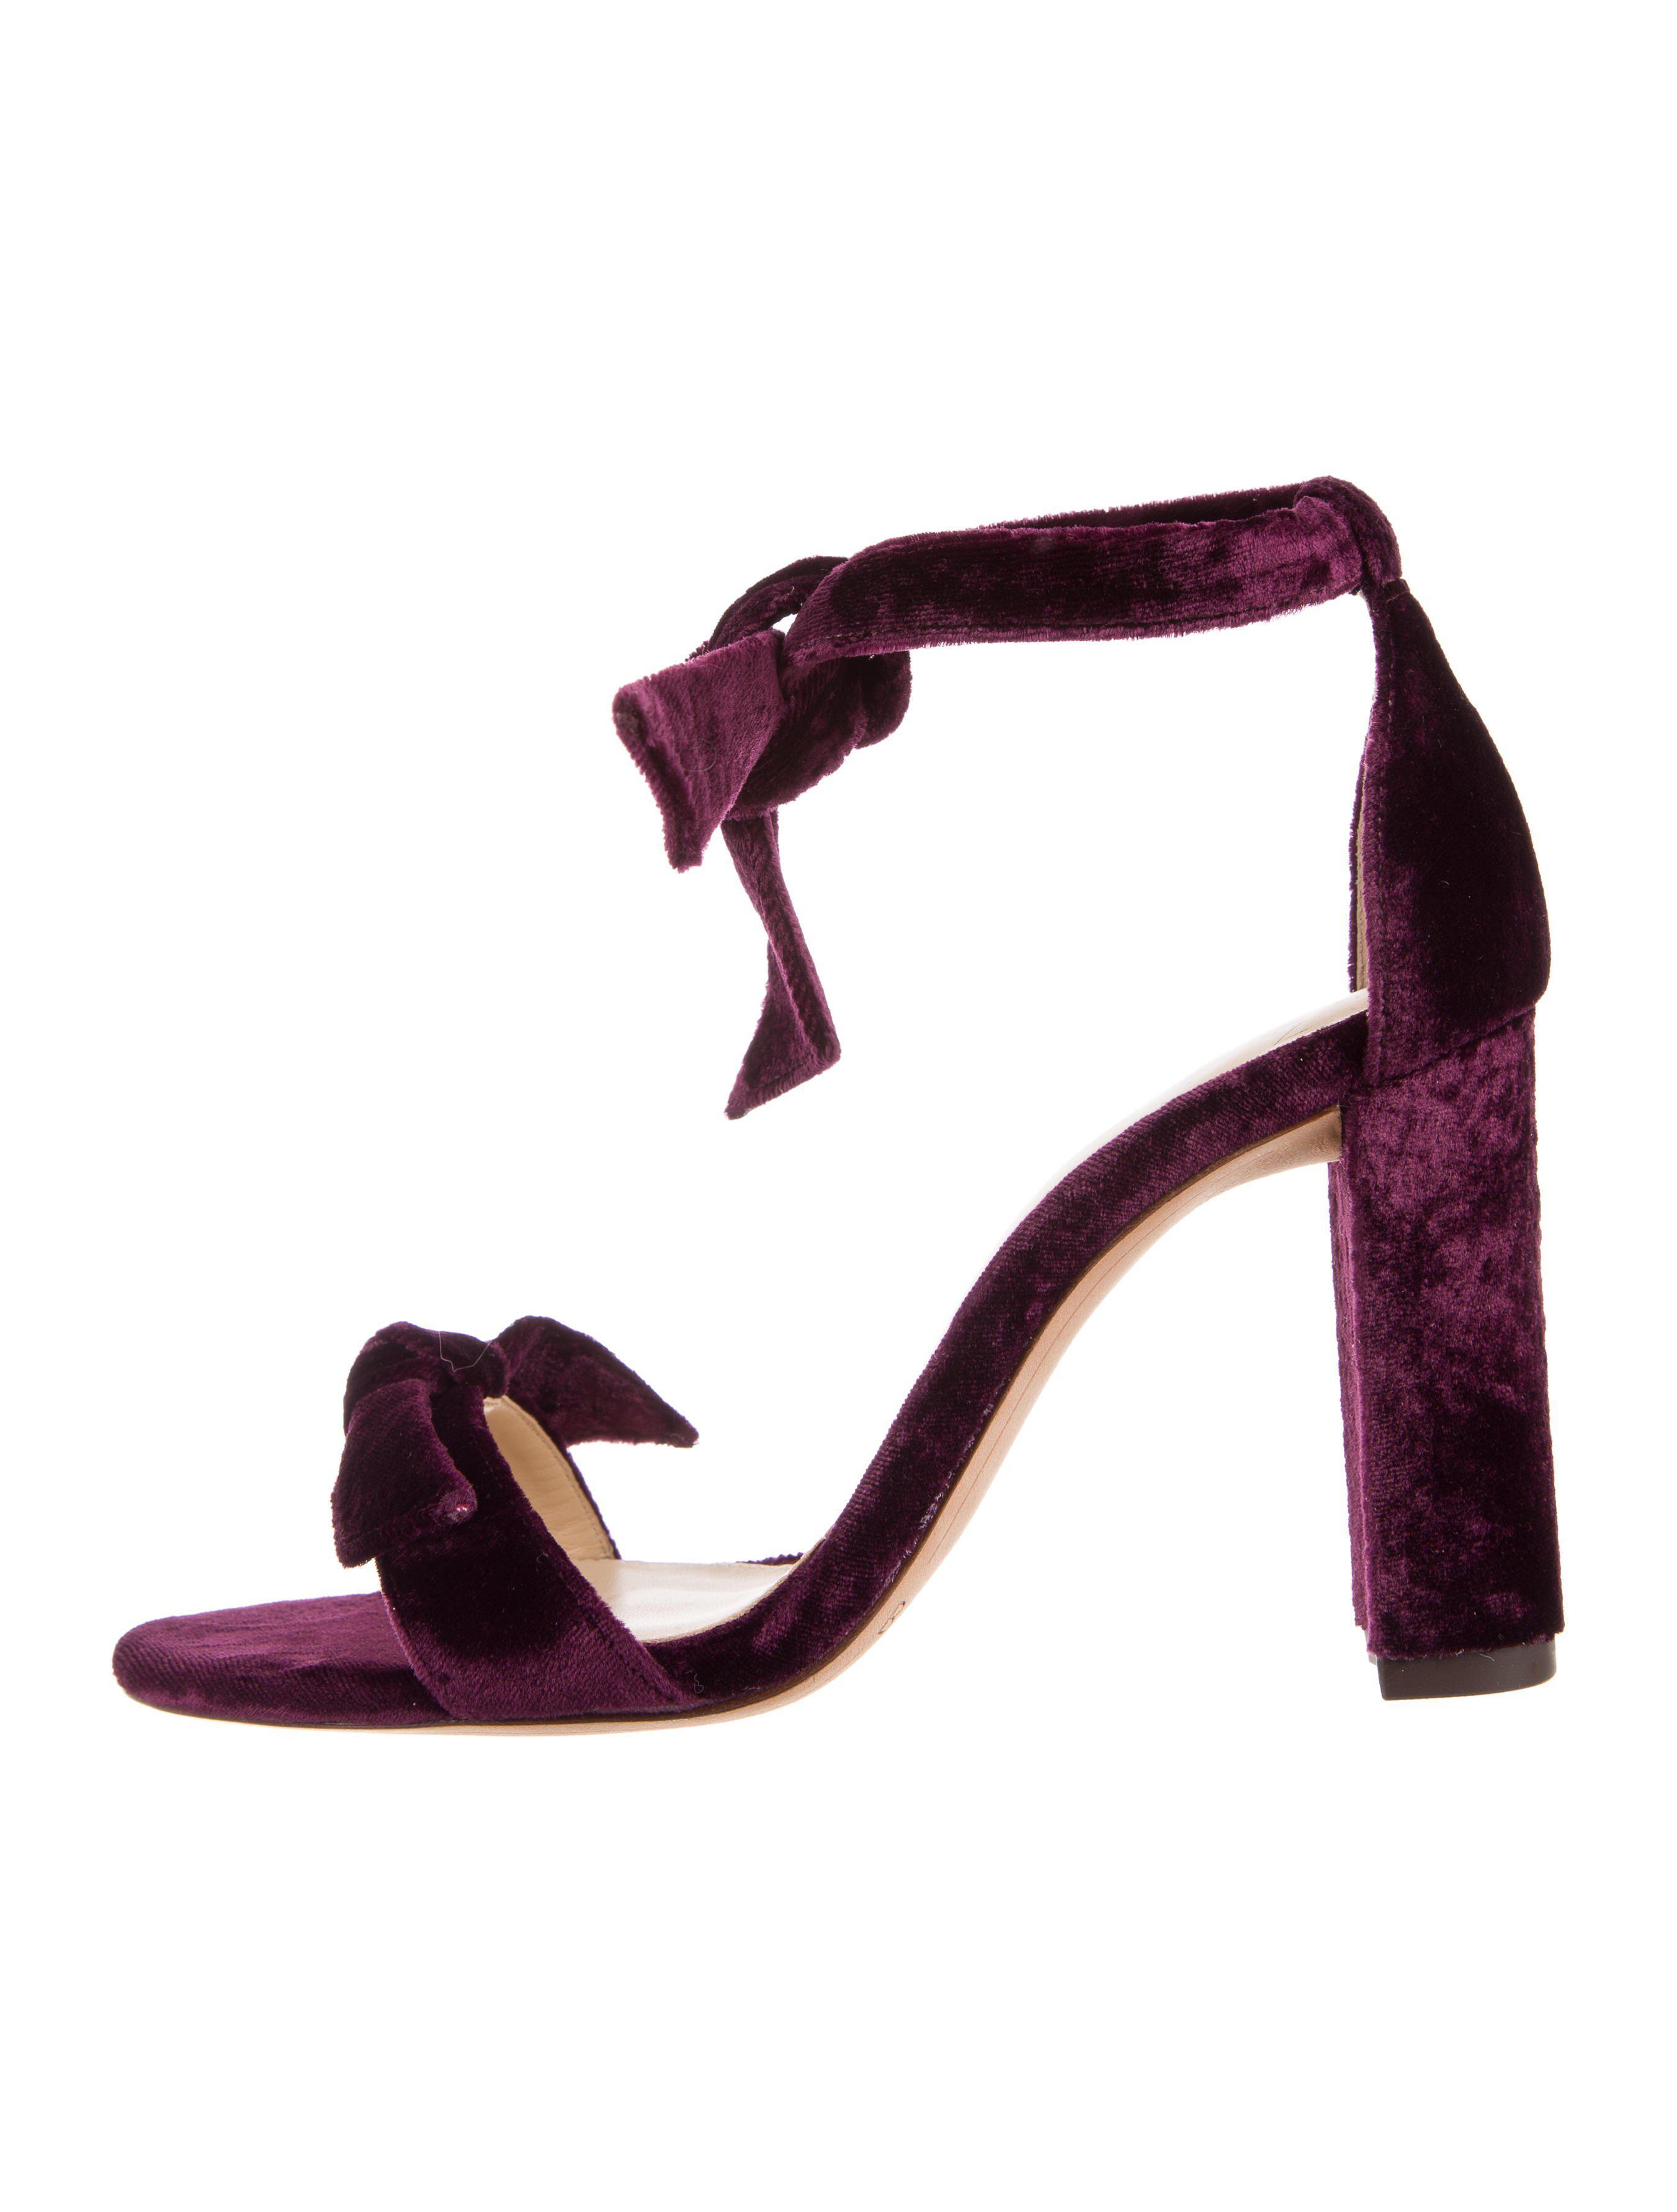 Alexandre Birman Clarita Velvet Sandals w/ Tags nicekicks cheap price buy cheap cheap with paypal for sale VIV526uC